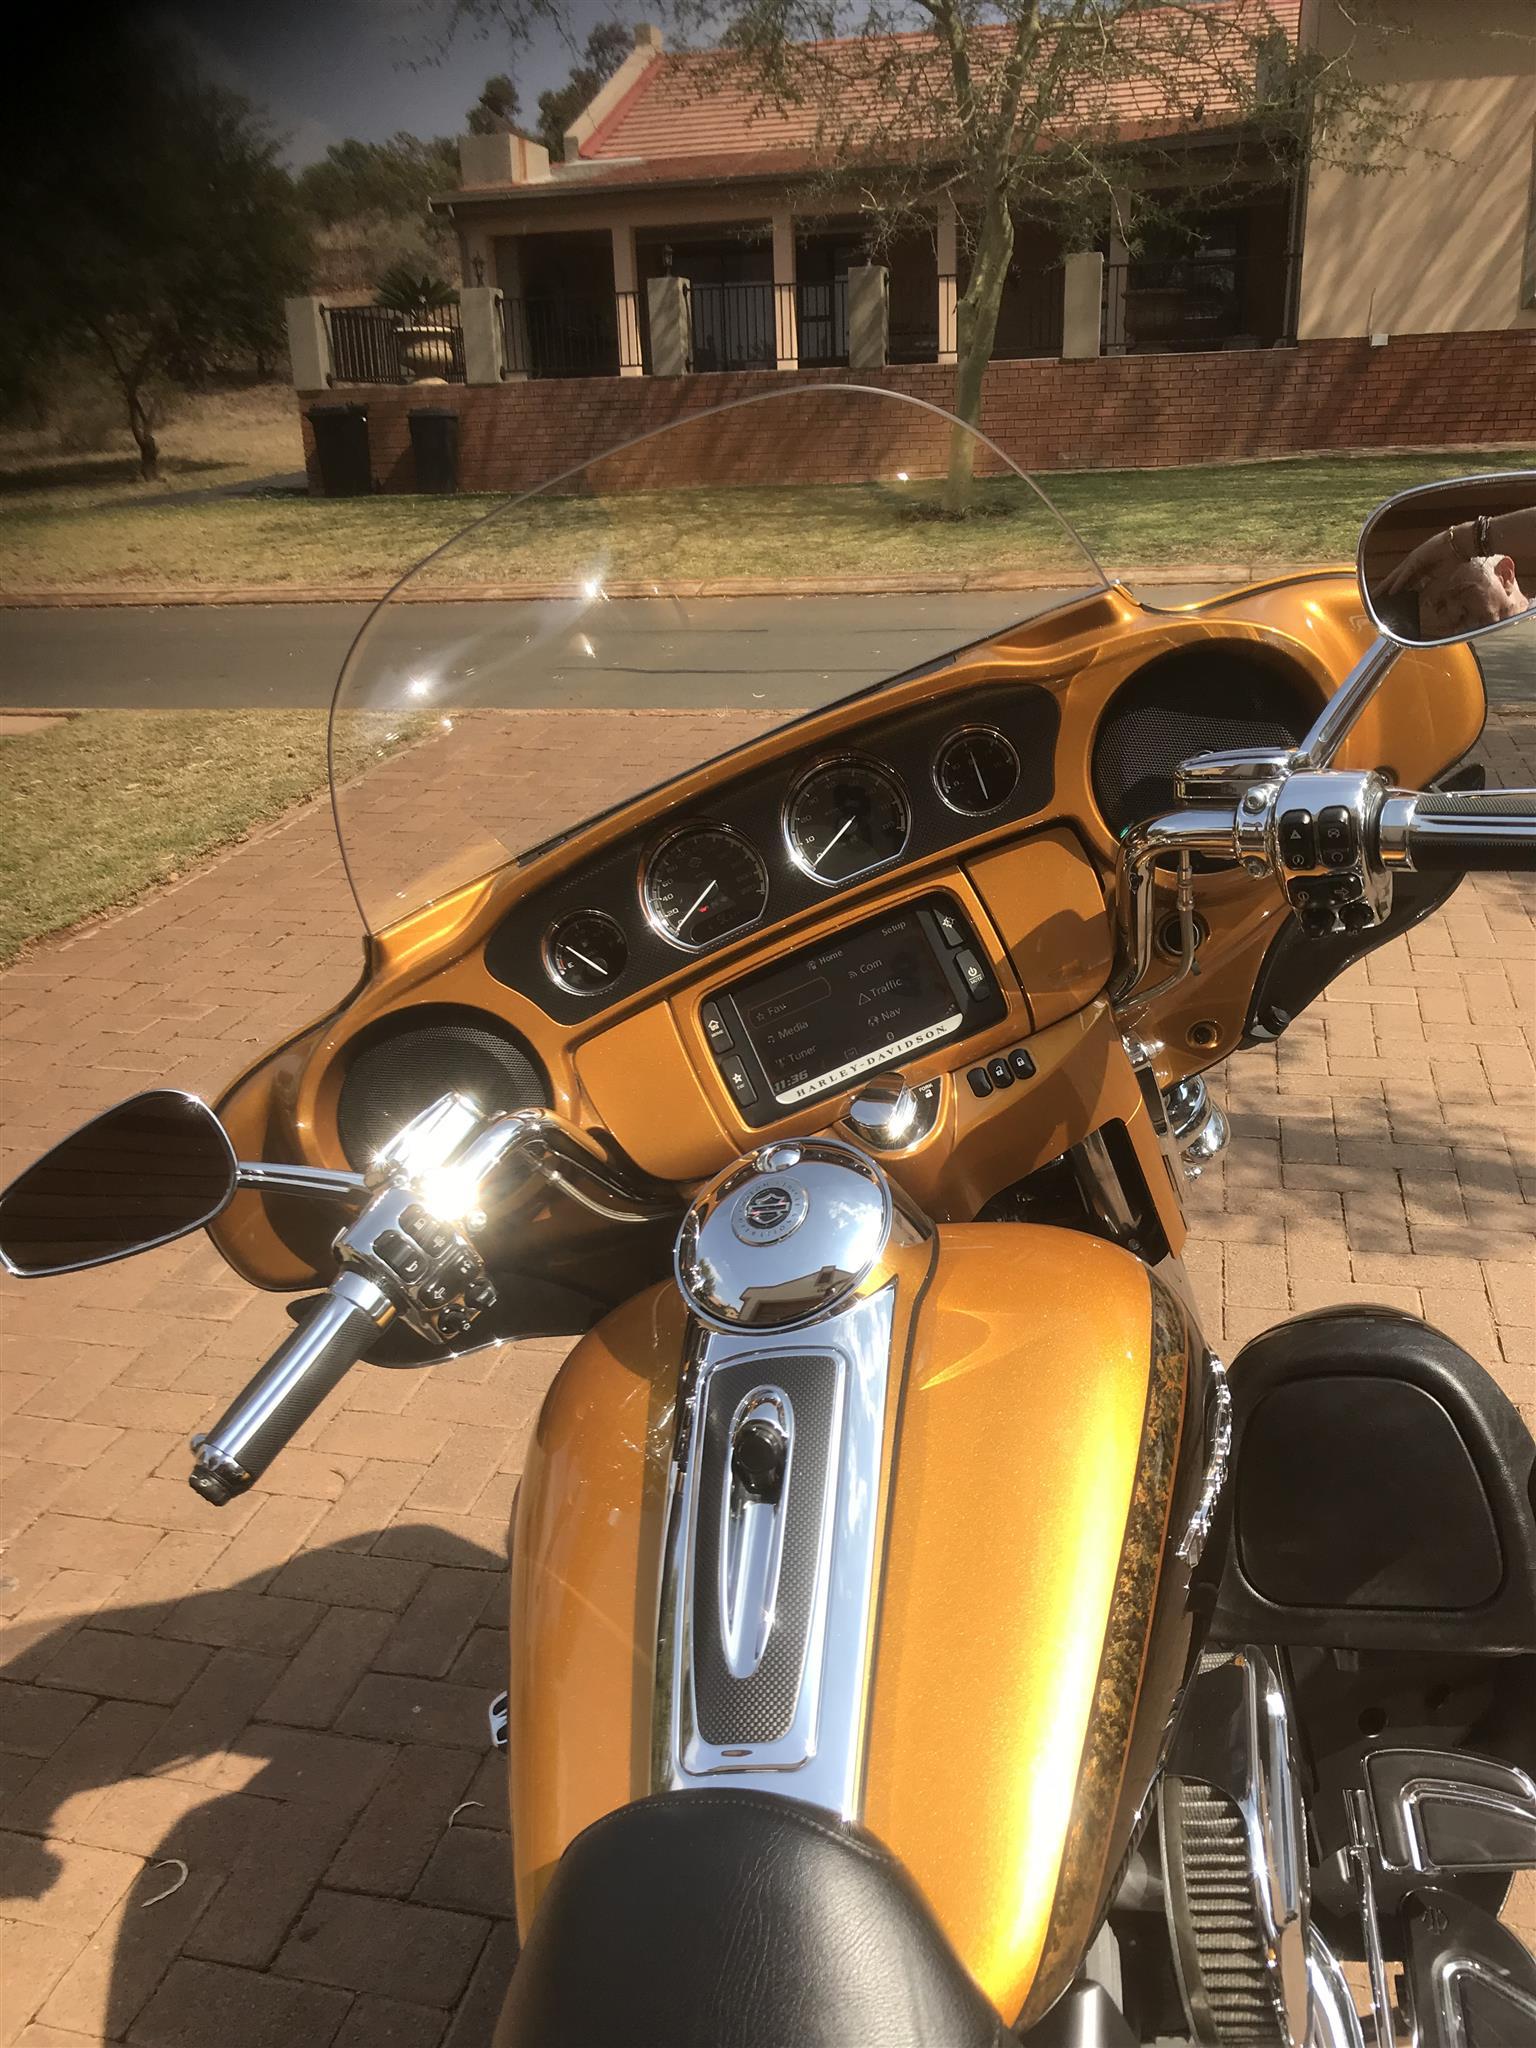 2015 Harley Davidson FLHT